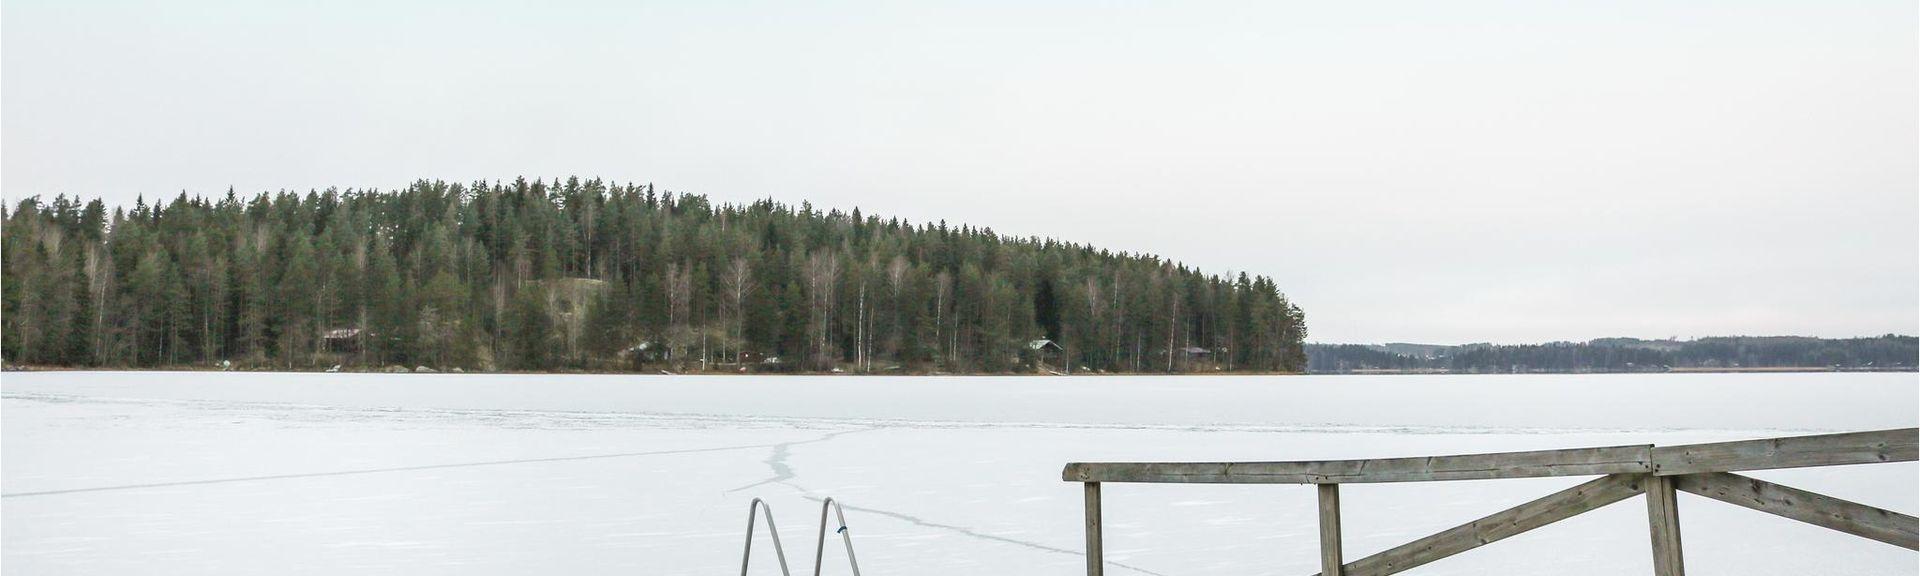 Ristinkirkko, Lahti, Lahti, Päijänne-Tavastland, Finland